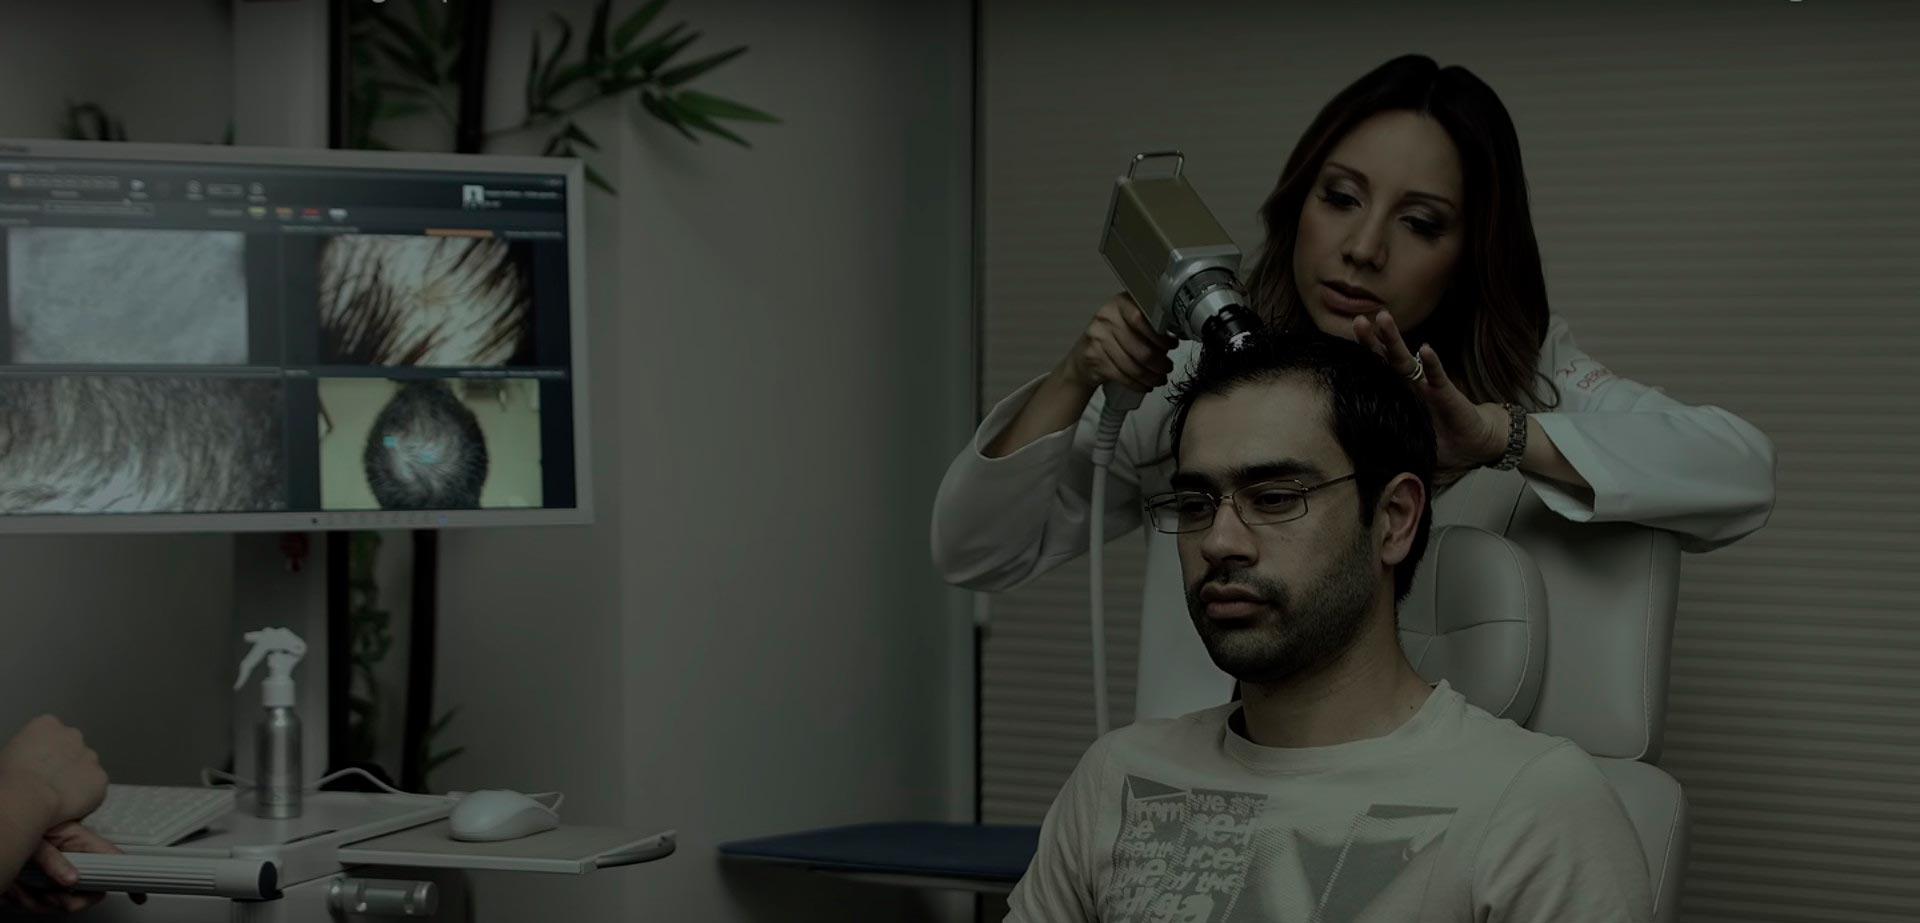 cirugia de transplante de cabello